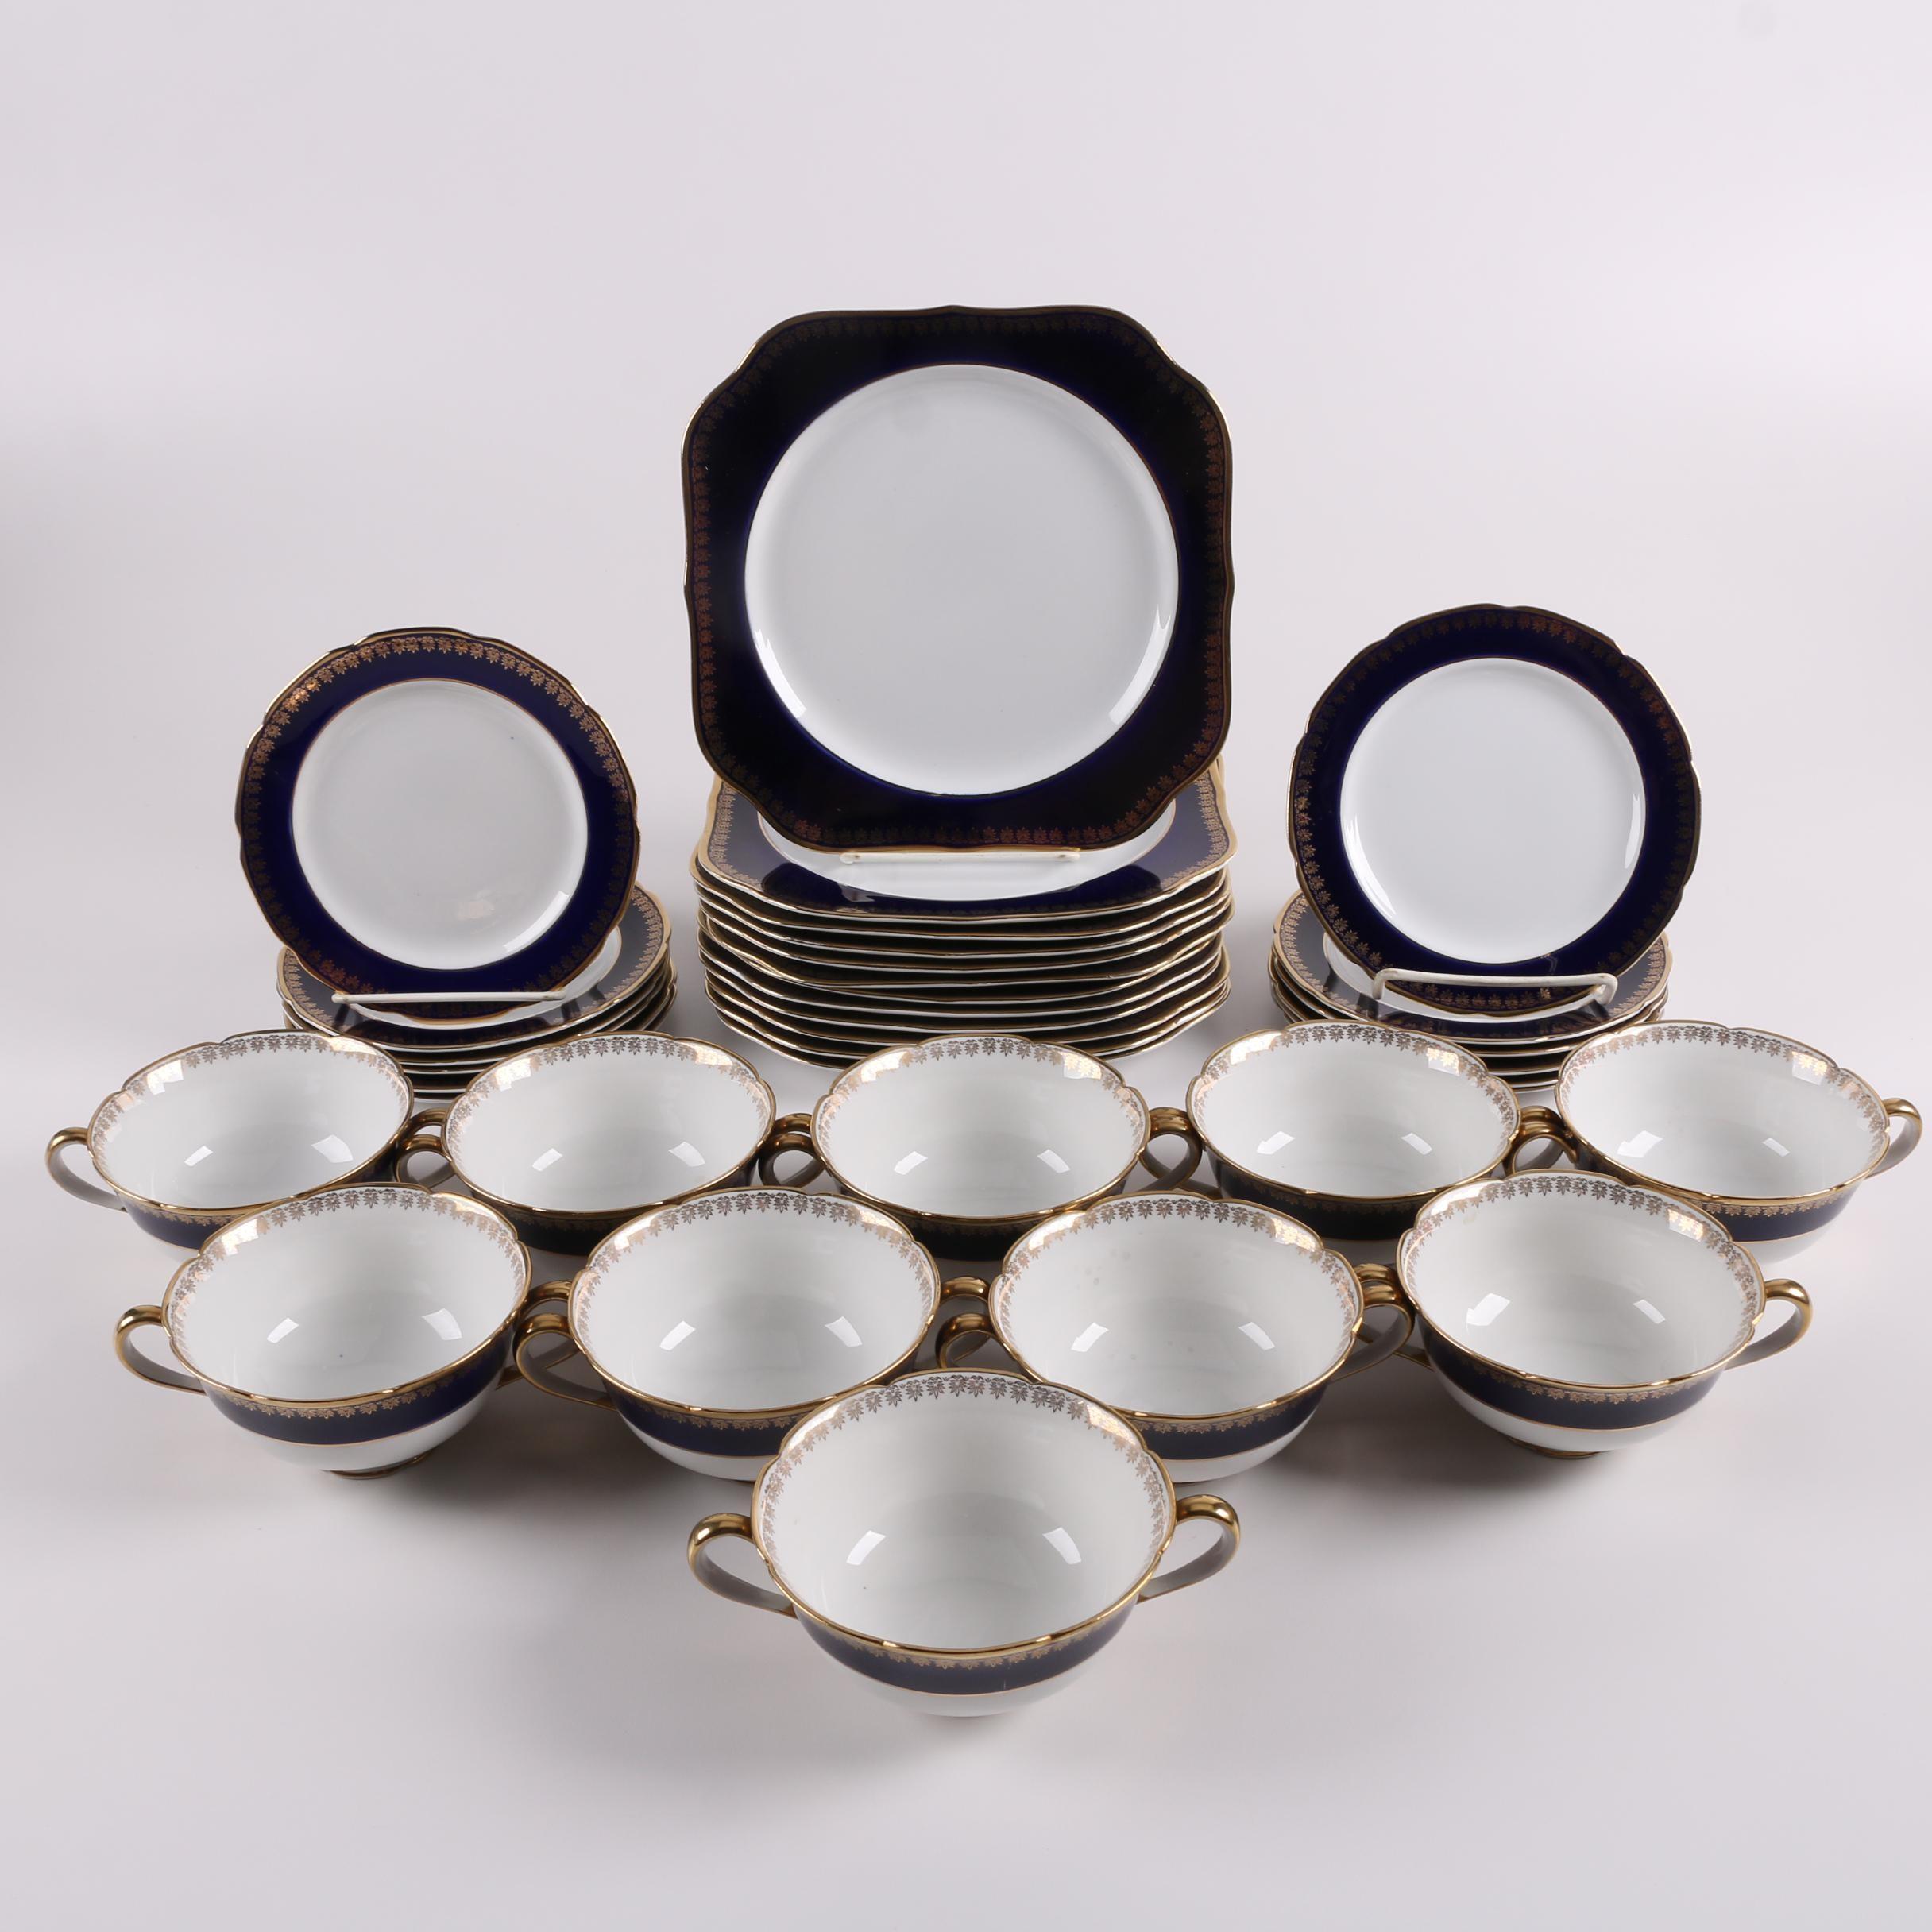 Japanese Kokura Ware Porcelain Plates and Cream Soup Bowls